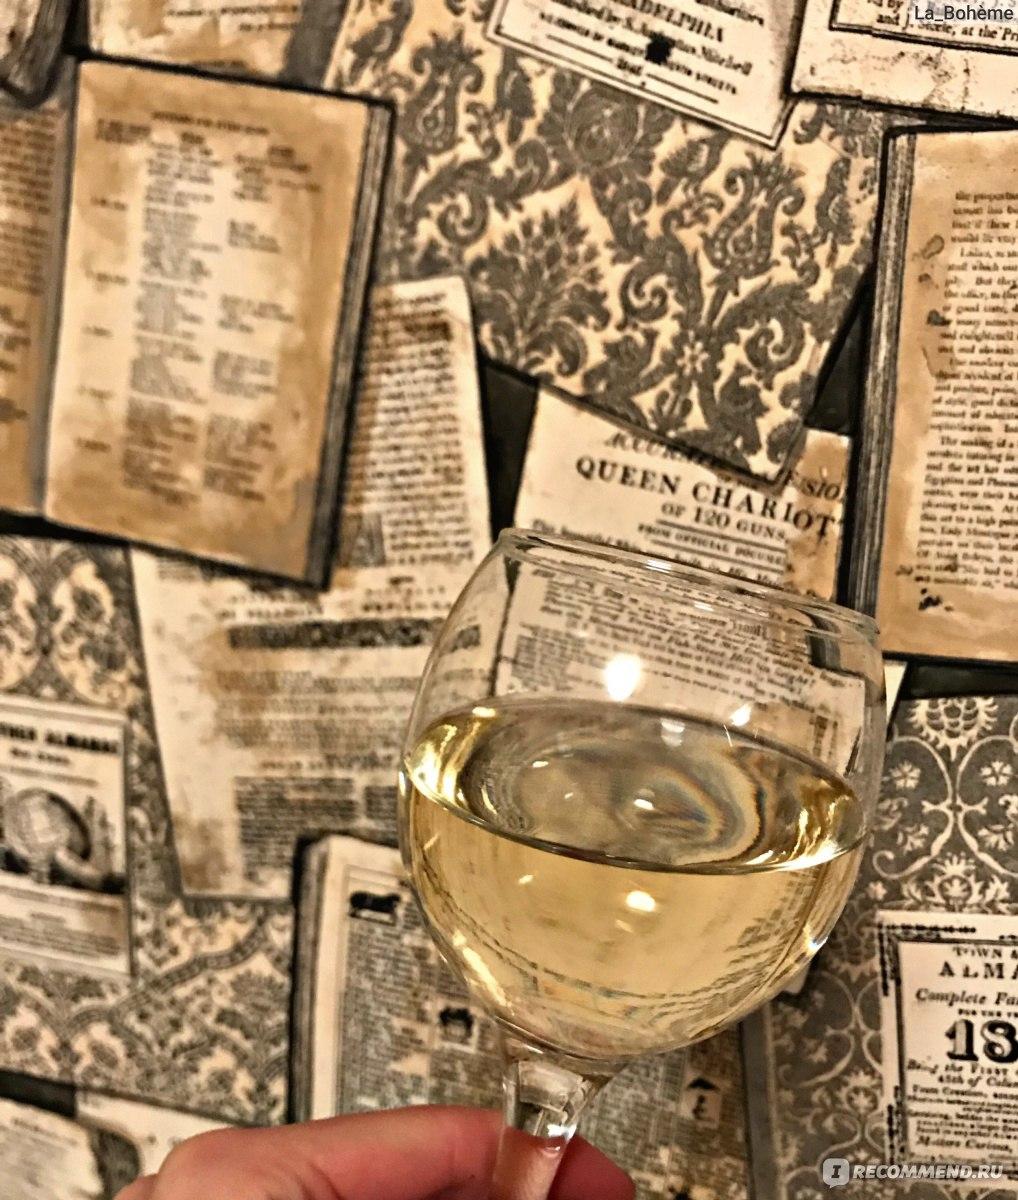 Белое вино желтого цвета